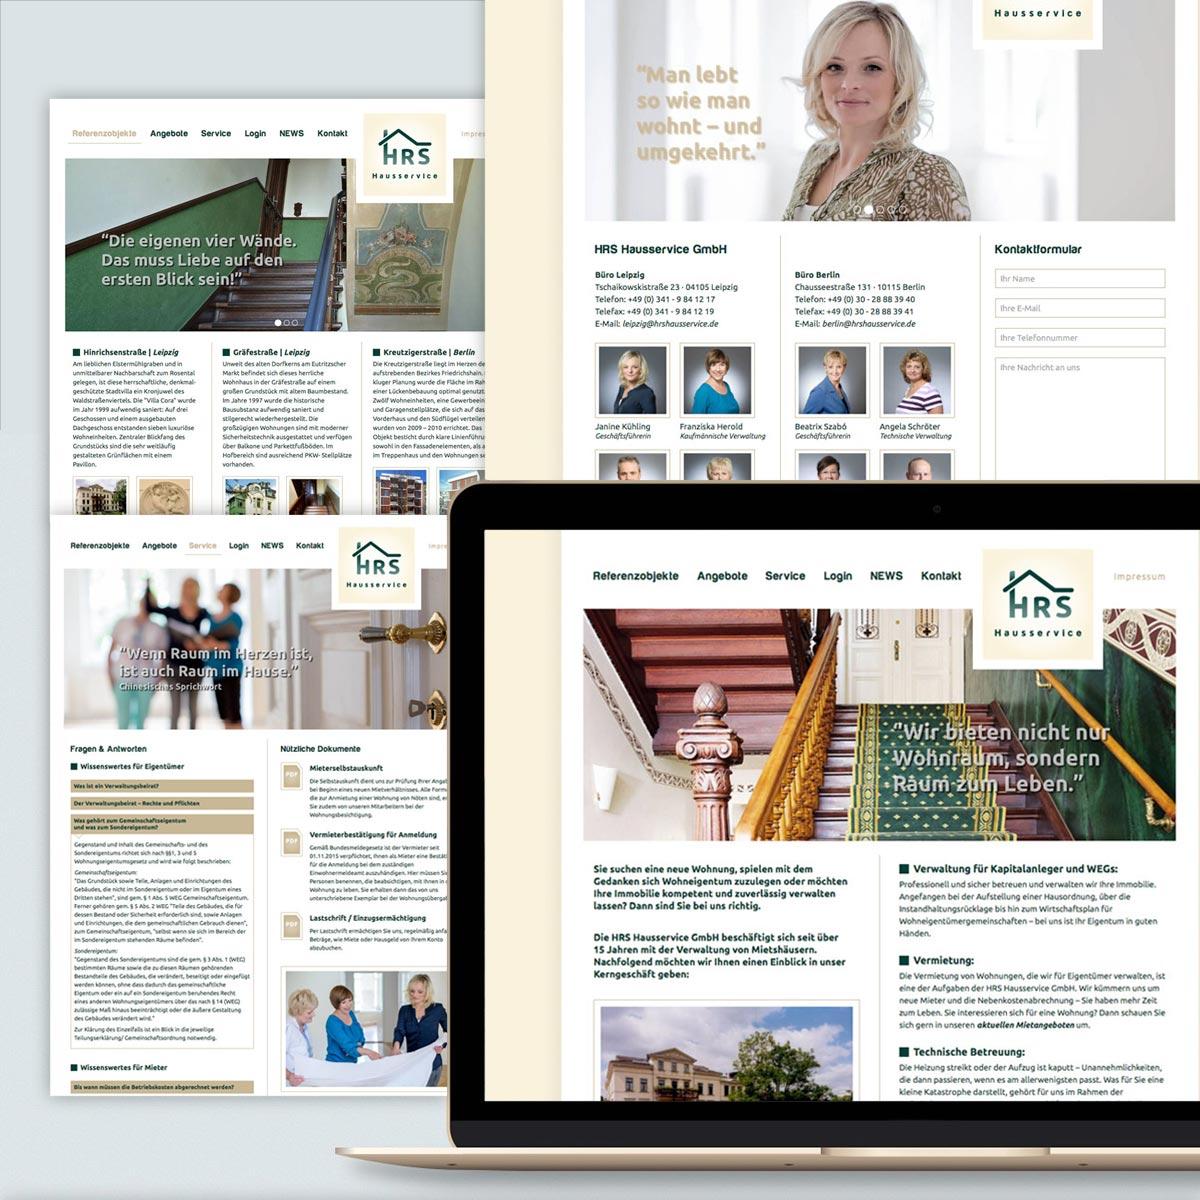 kathrin, krasselt, mediendesign, grafik, grafiker, leipzig, werbung, webdesign, logo, corporate, design, hrs